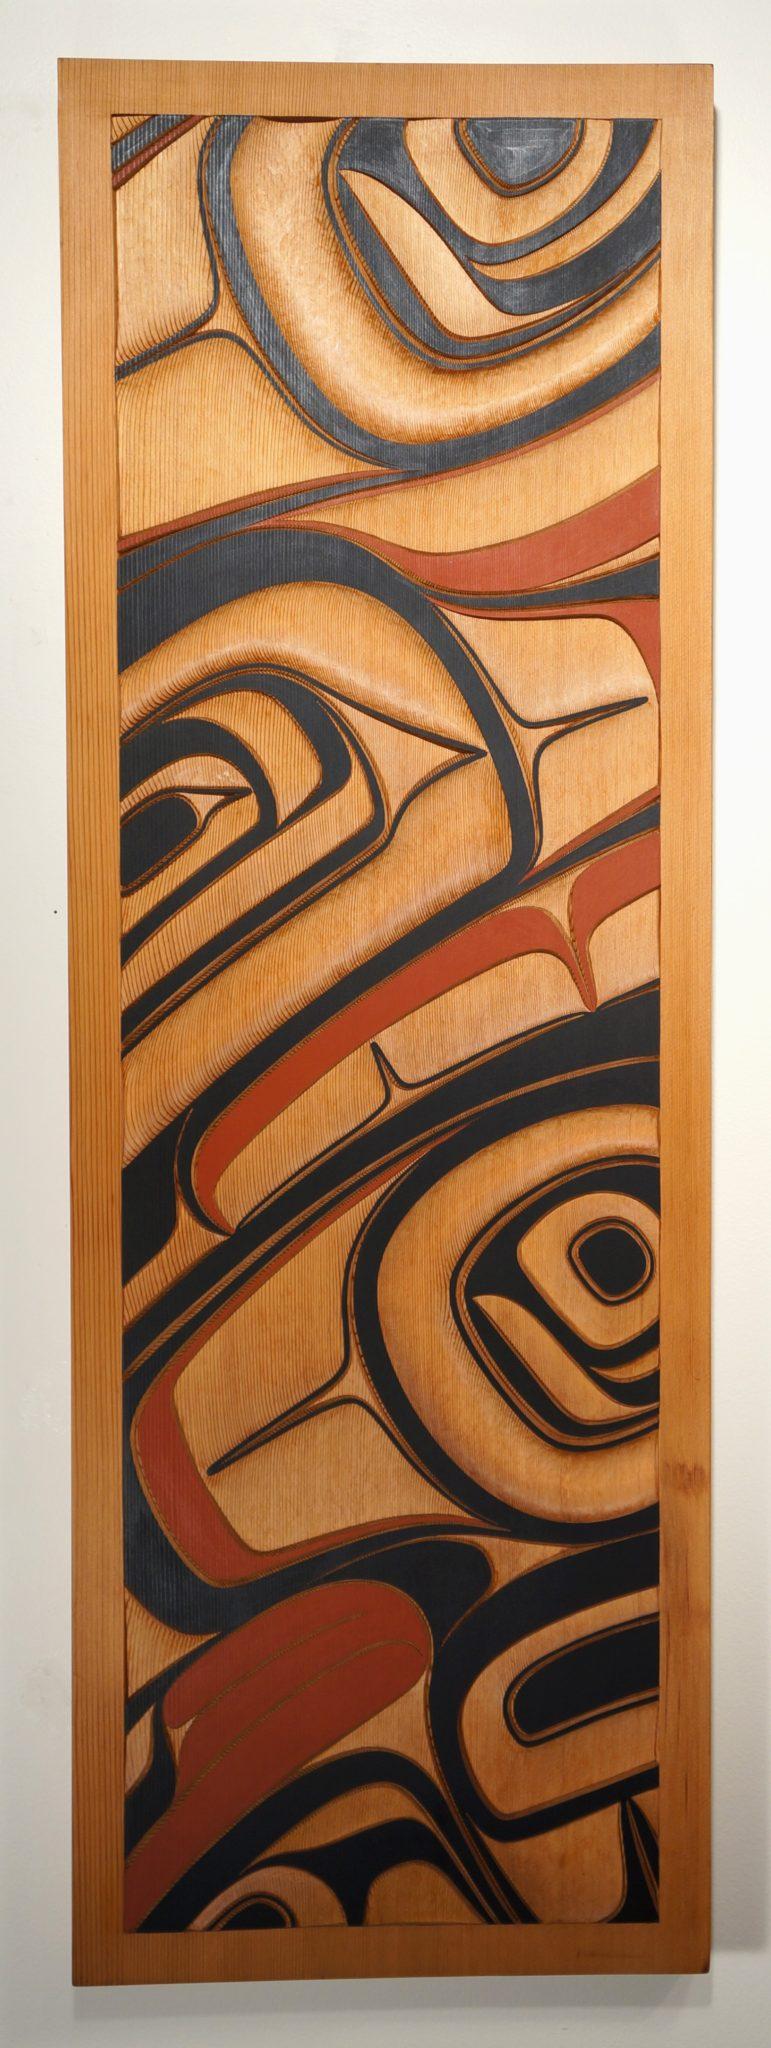 "Raven Panel Phil Gray Tsimshian Red Cedar & Paint 46.75""H x15.75""W x 2""D"